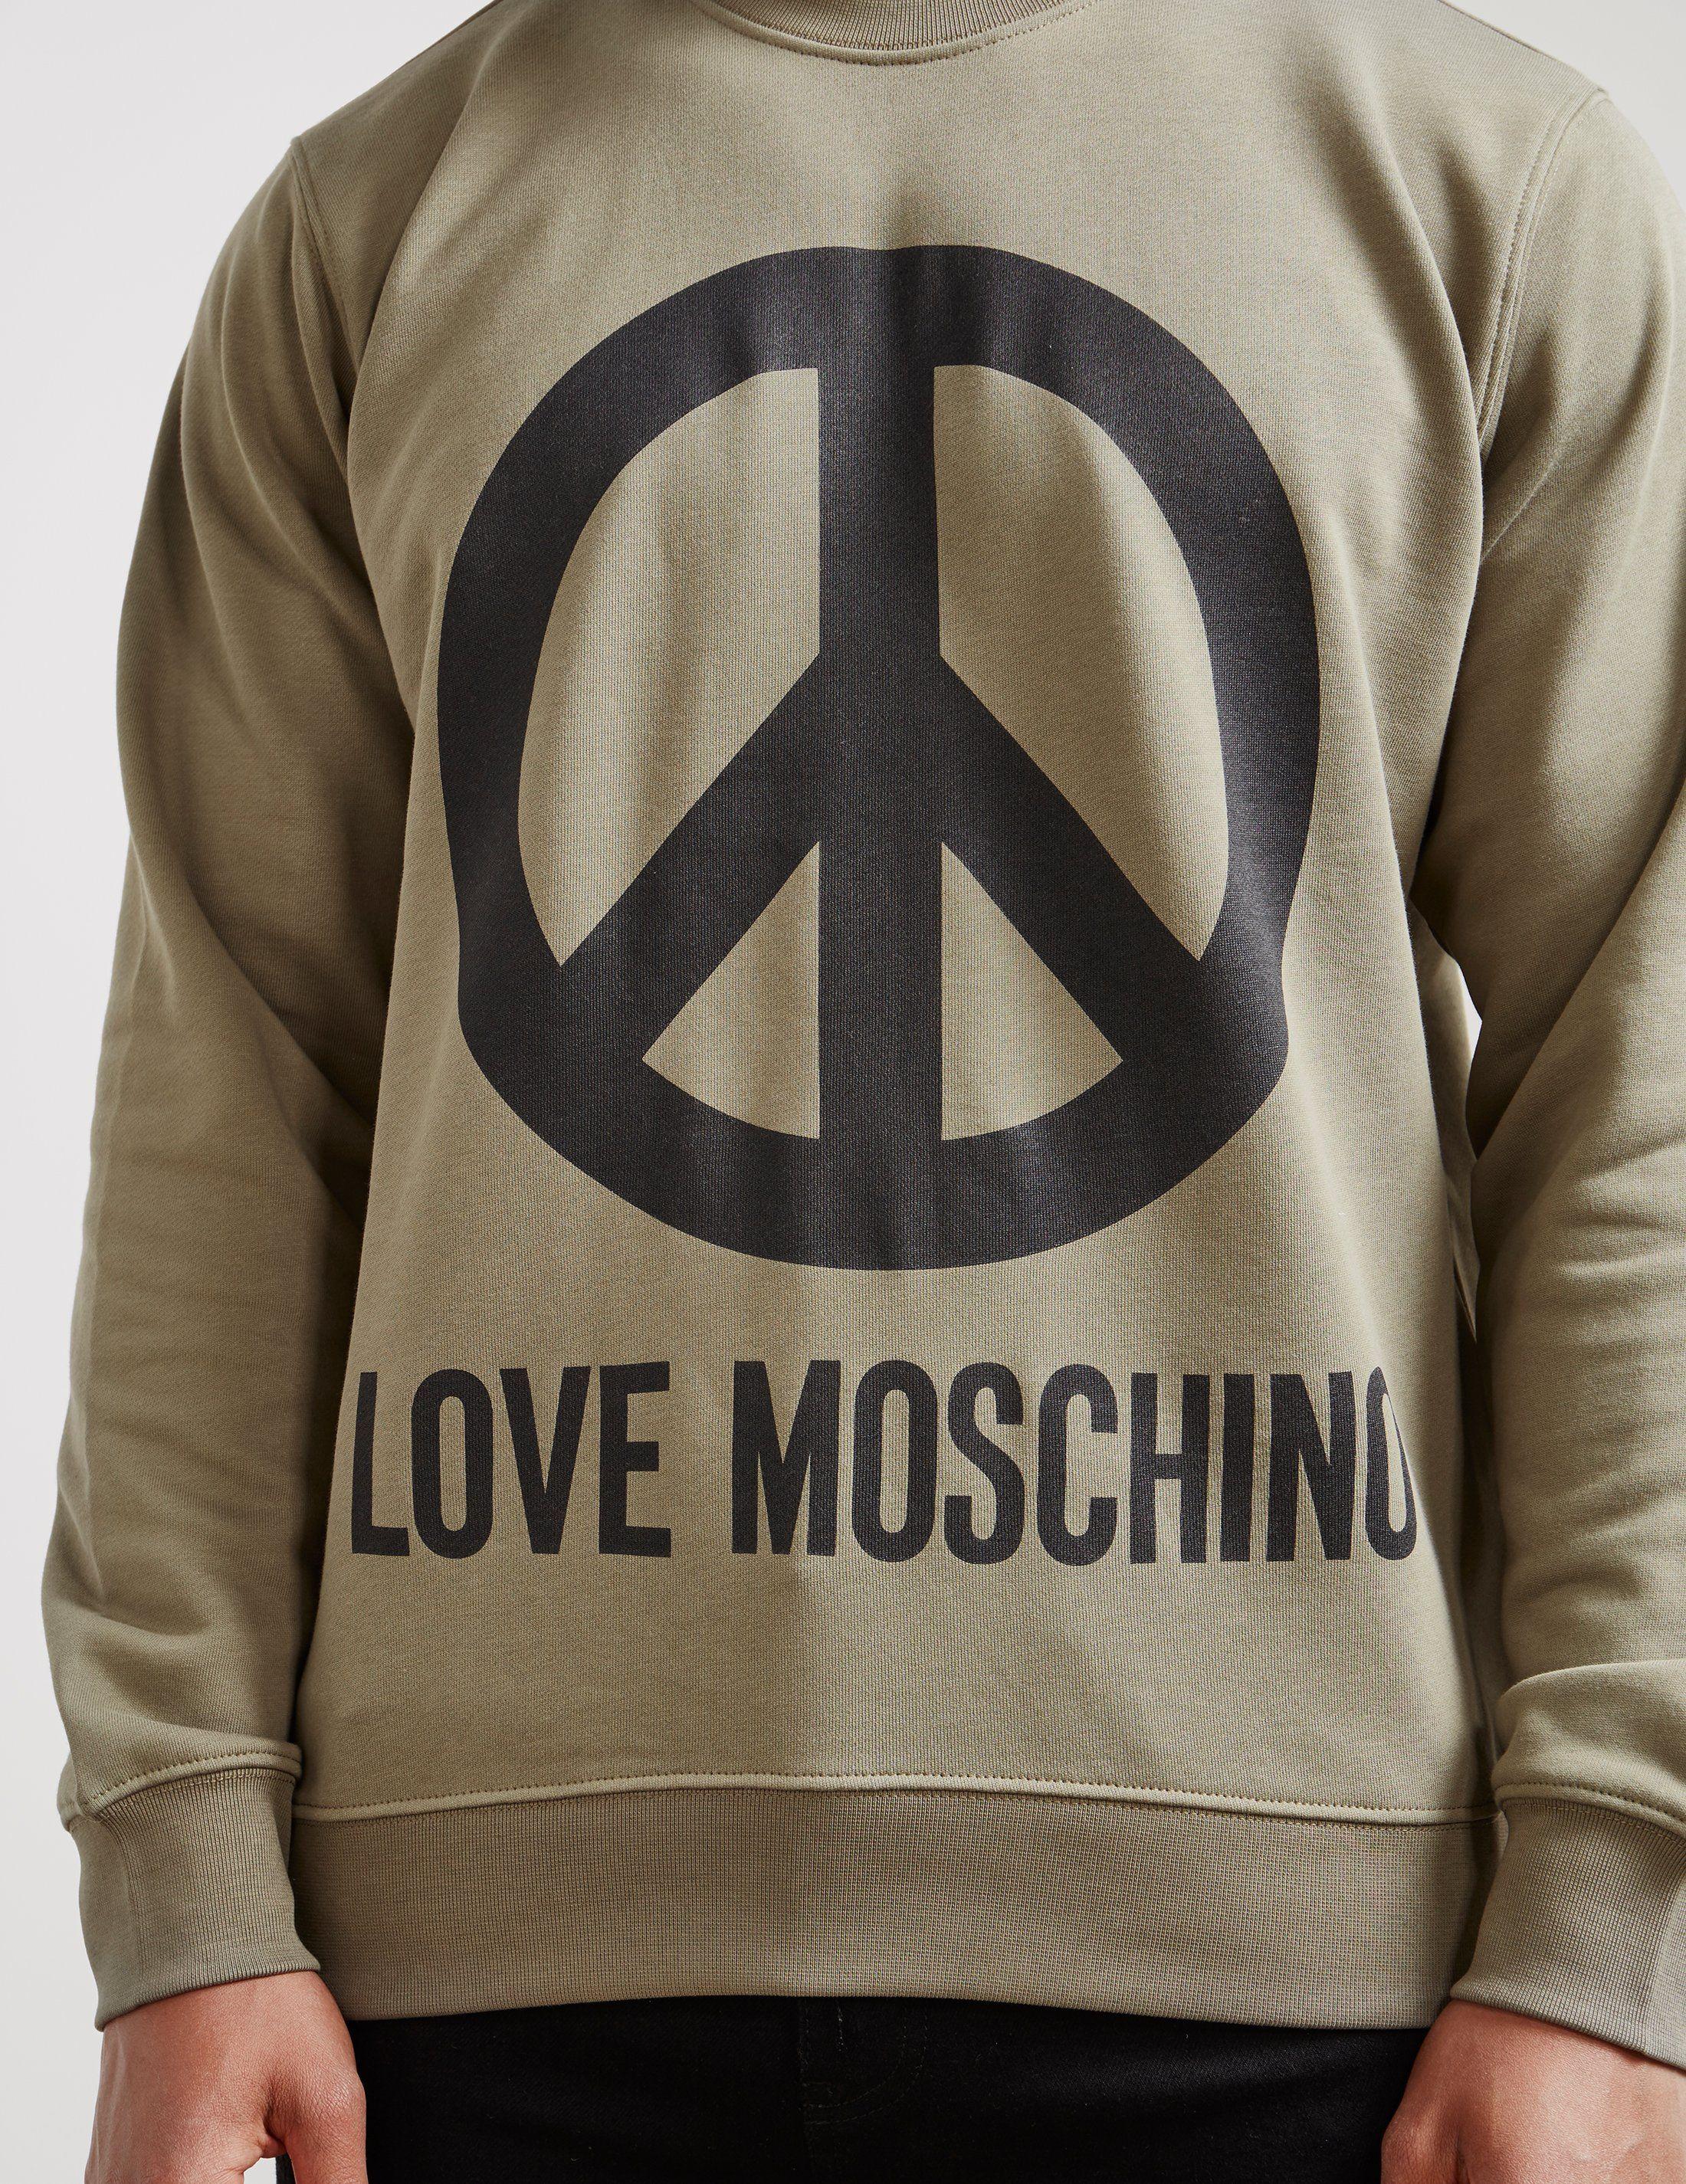 Love Moschino Large Peace Sweatshirt